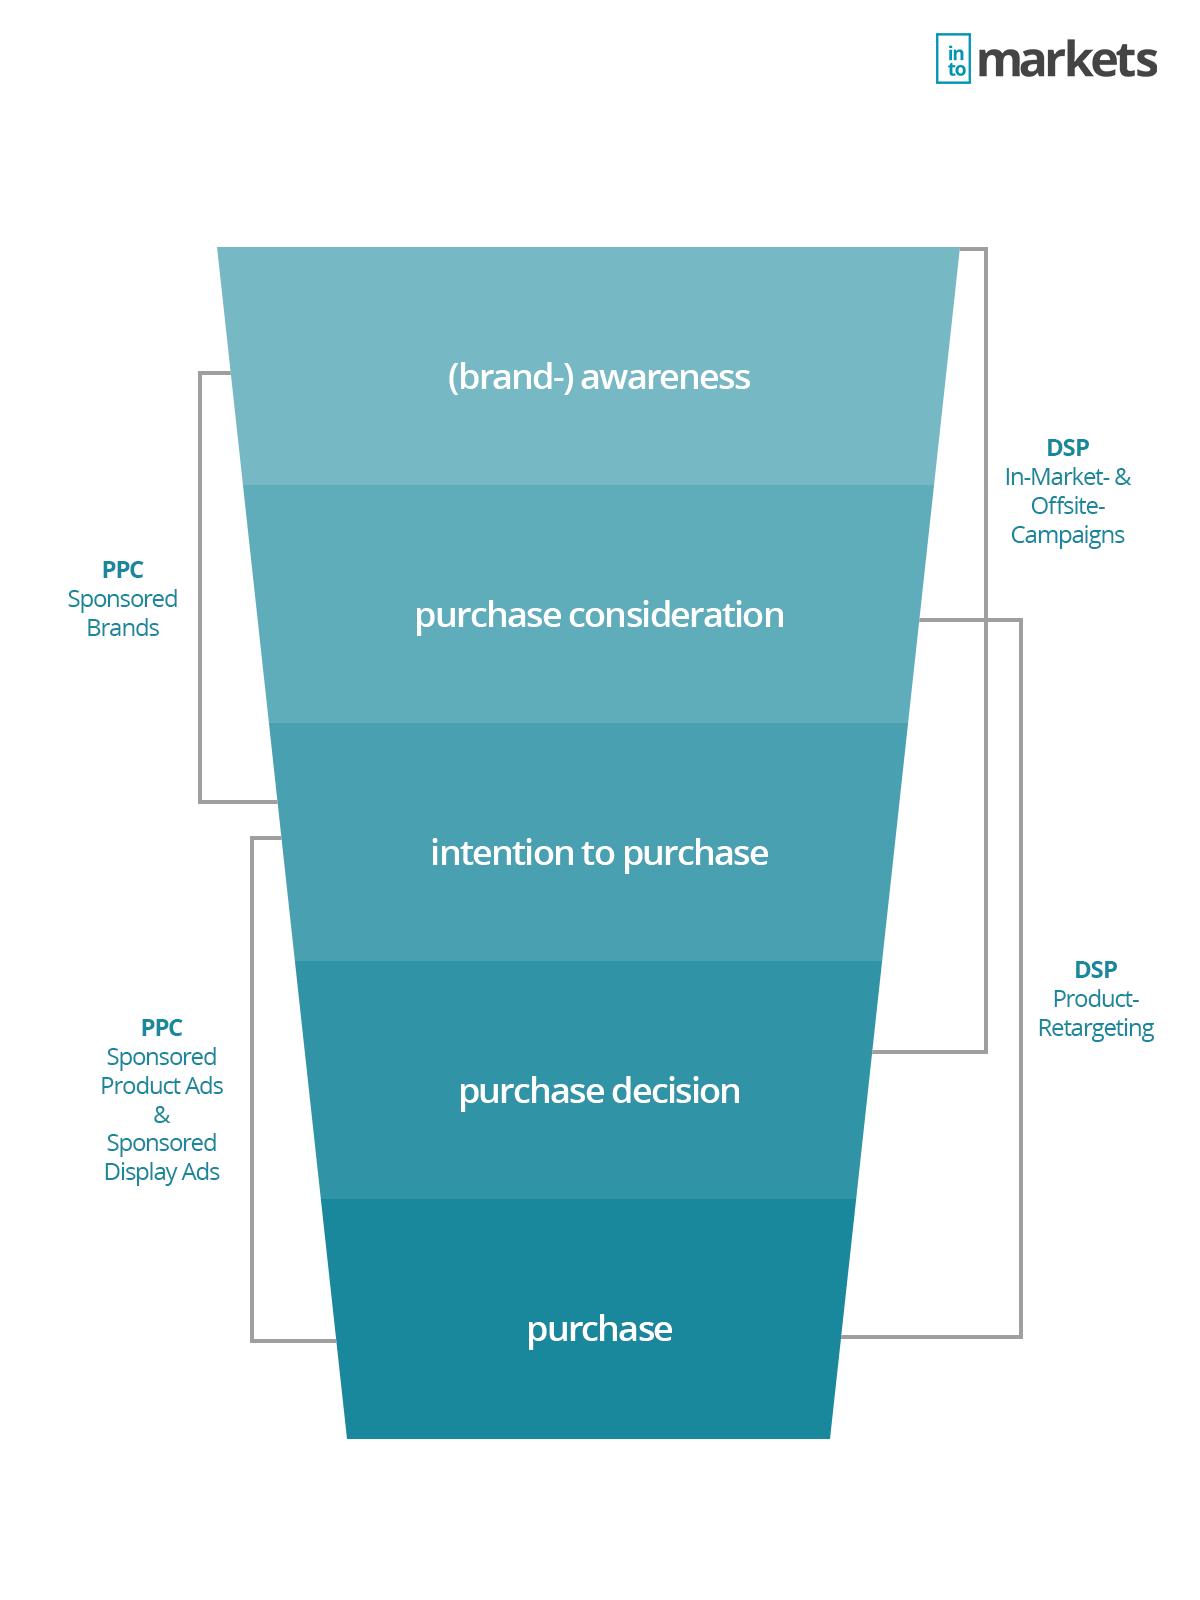 amazon-advertising-funnel-infographic-ppc-dsp